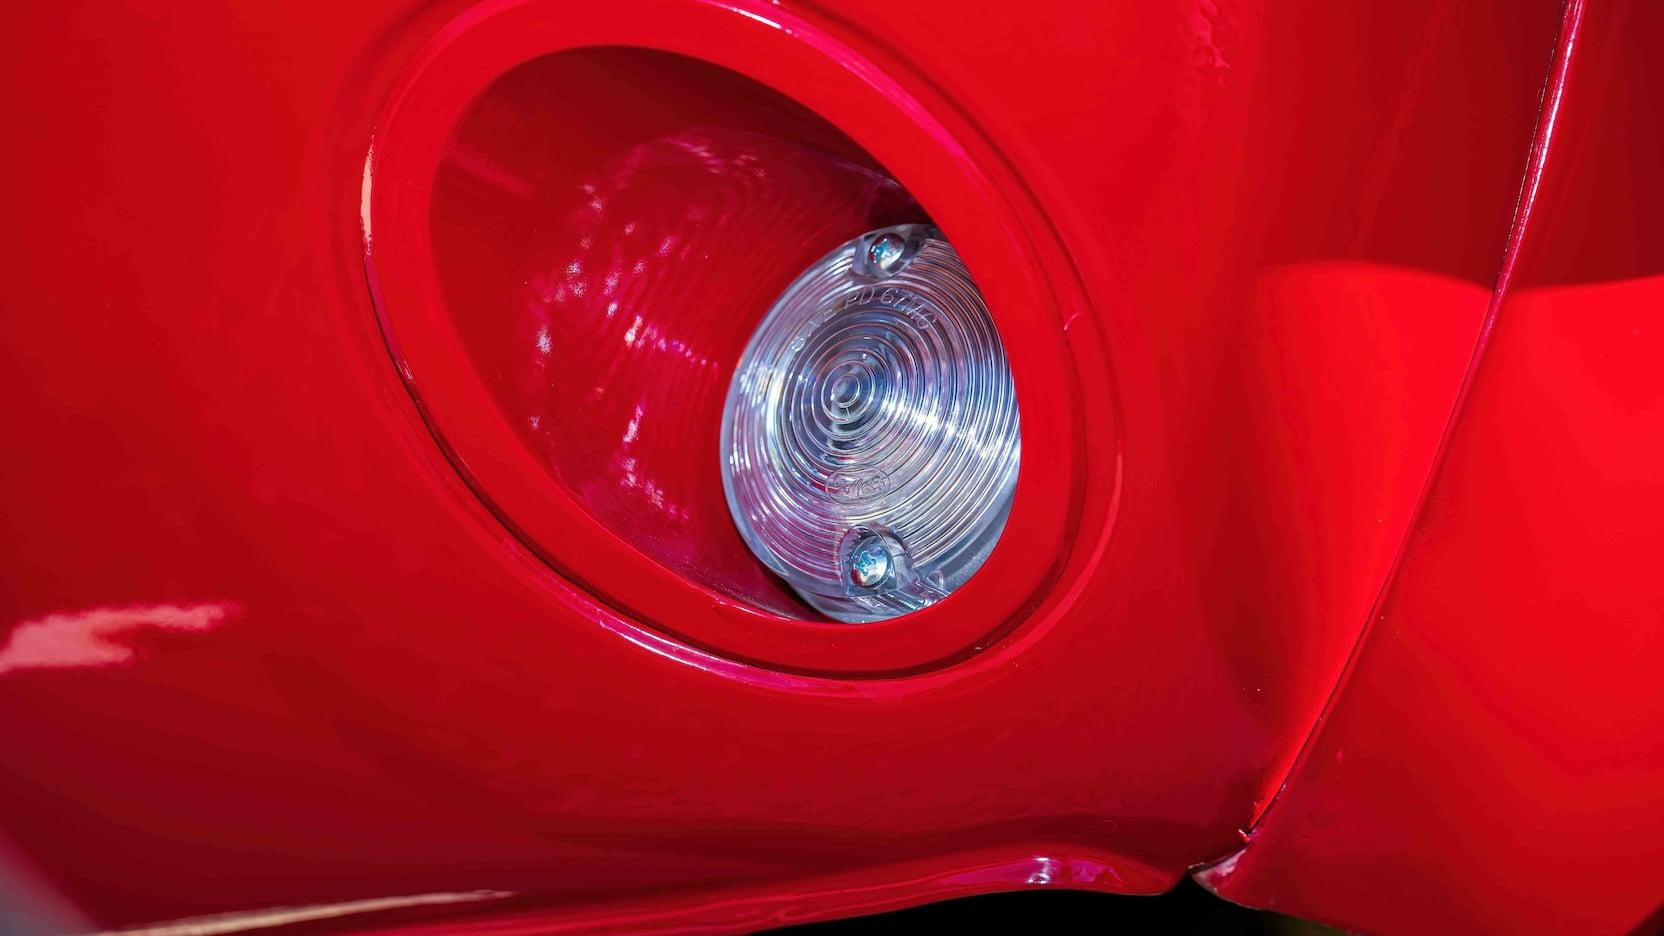 1967 Ford Mustang Holman-Moody Racer light detail